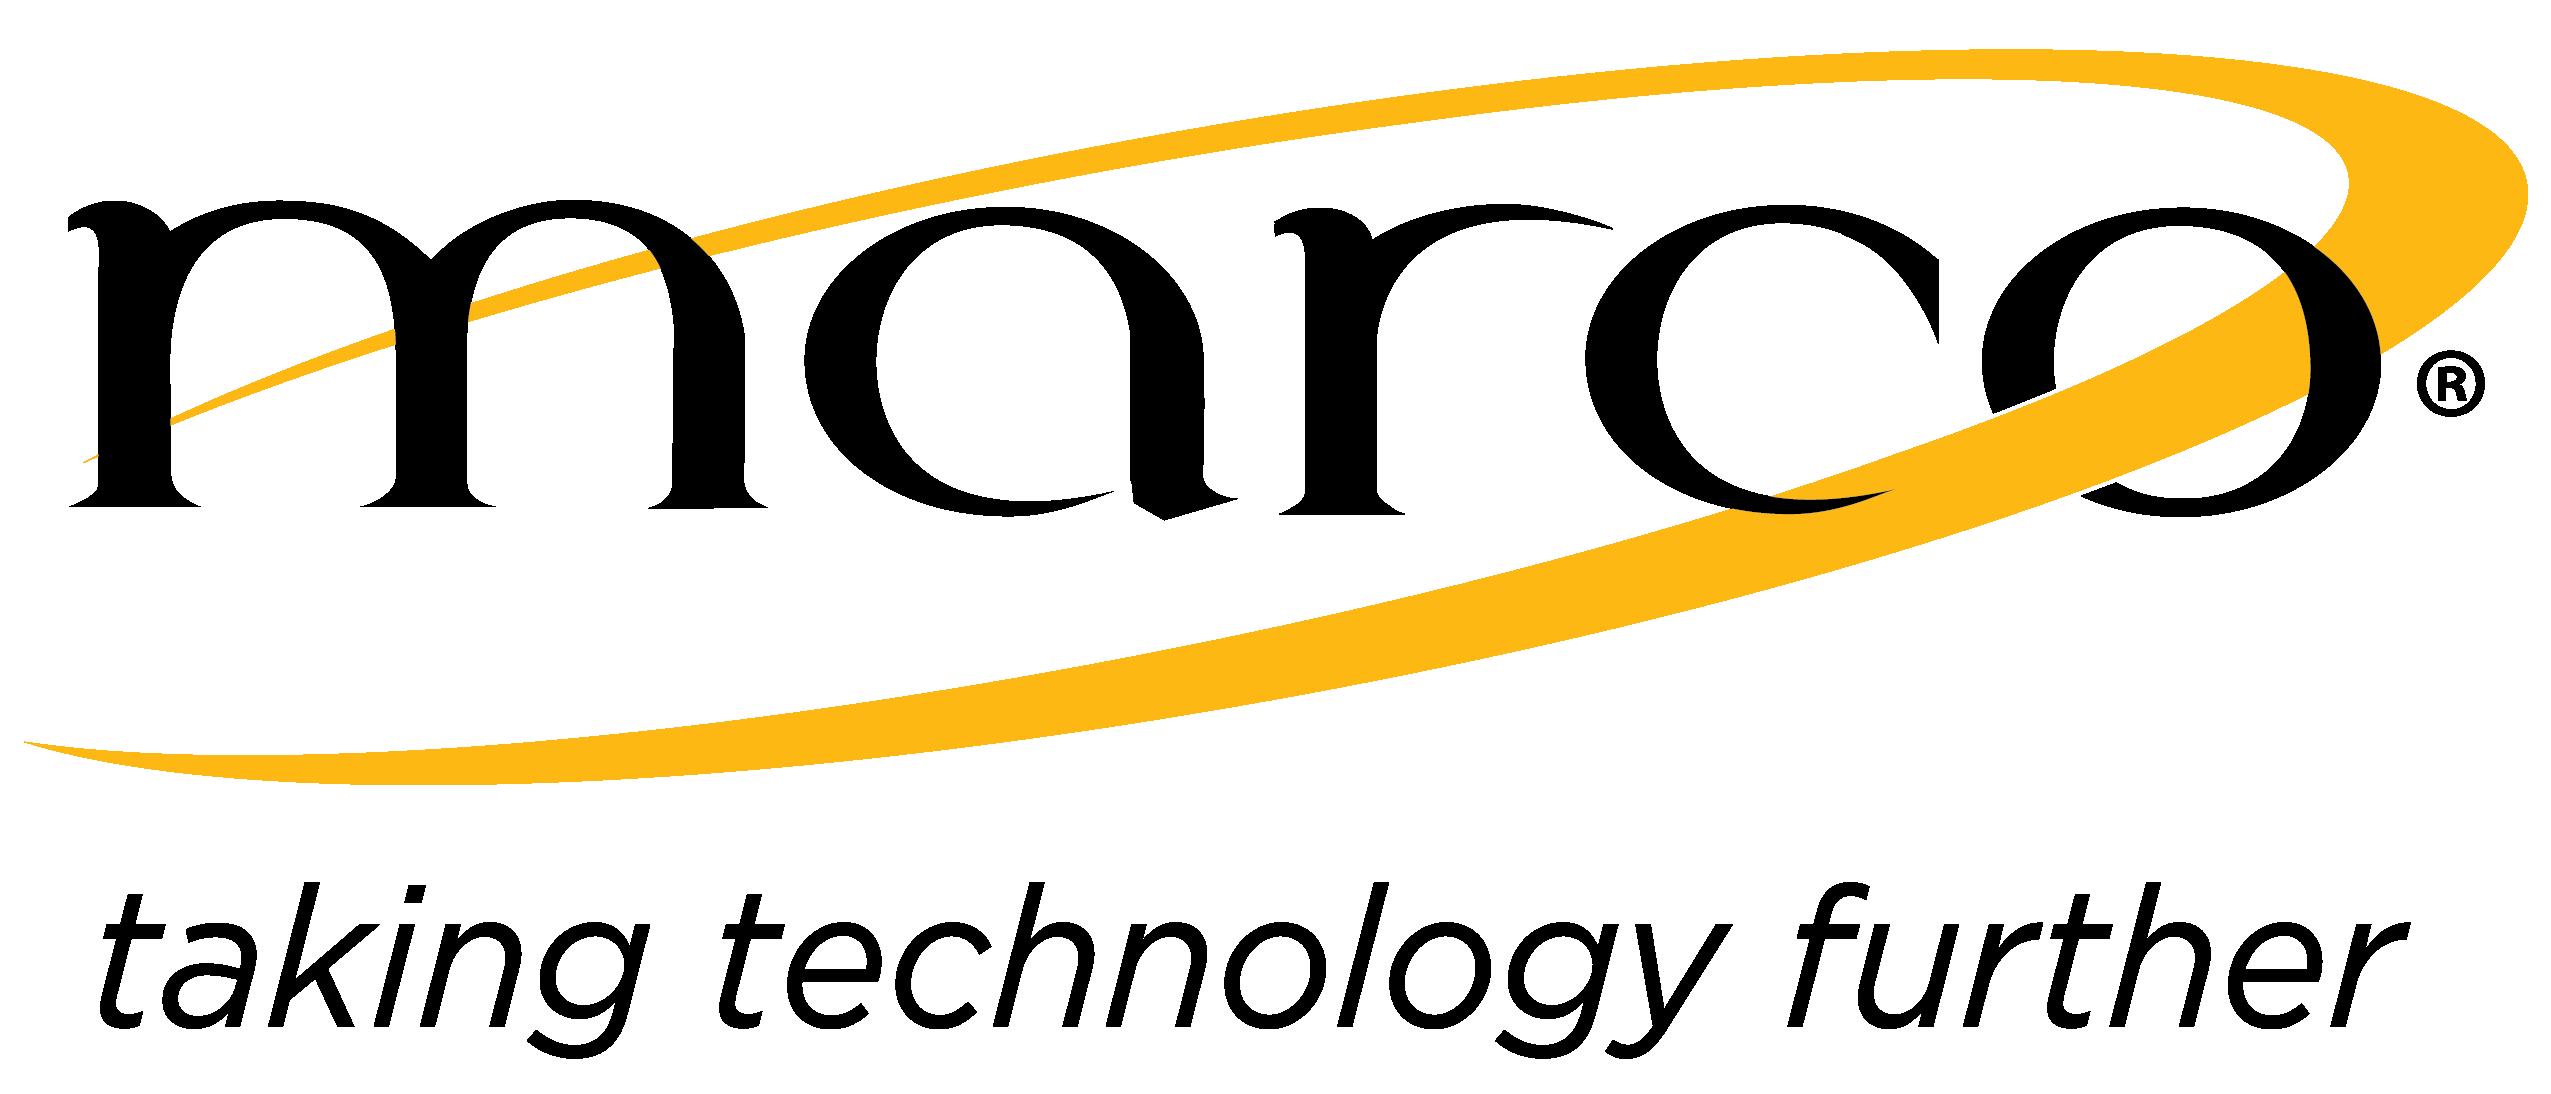 Marco Technologies LLC logo